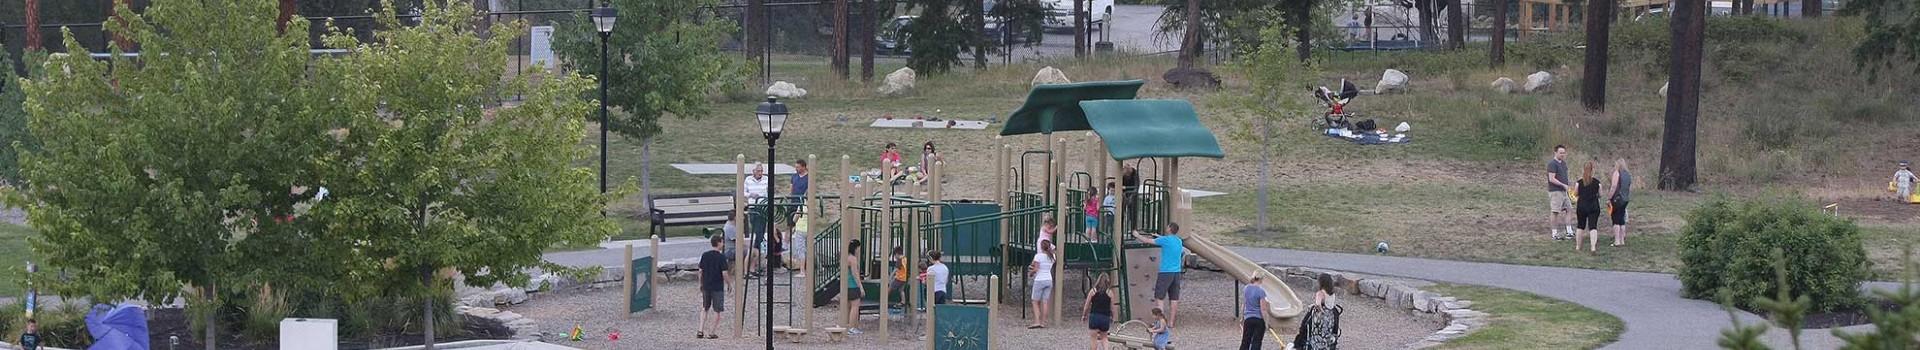 Children playing at Blair Pond park playground